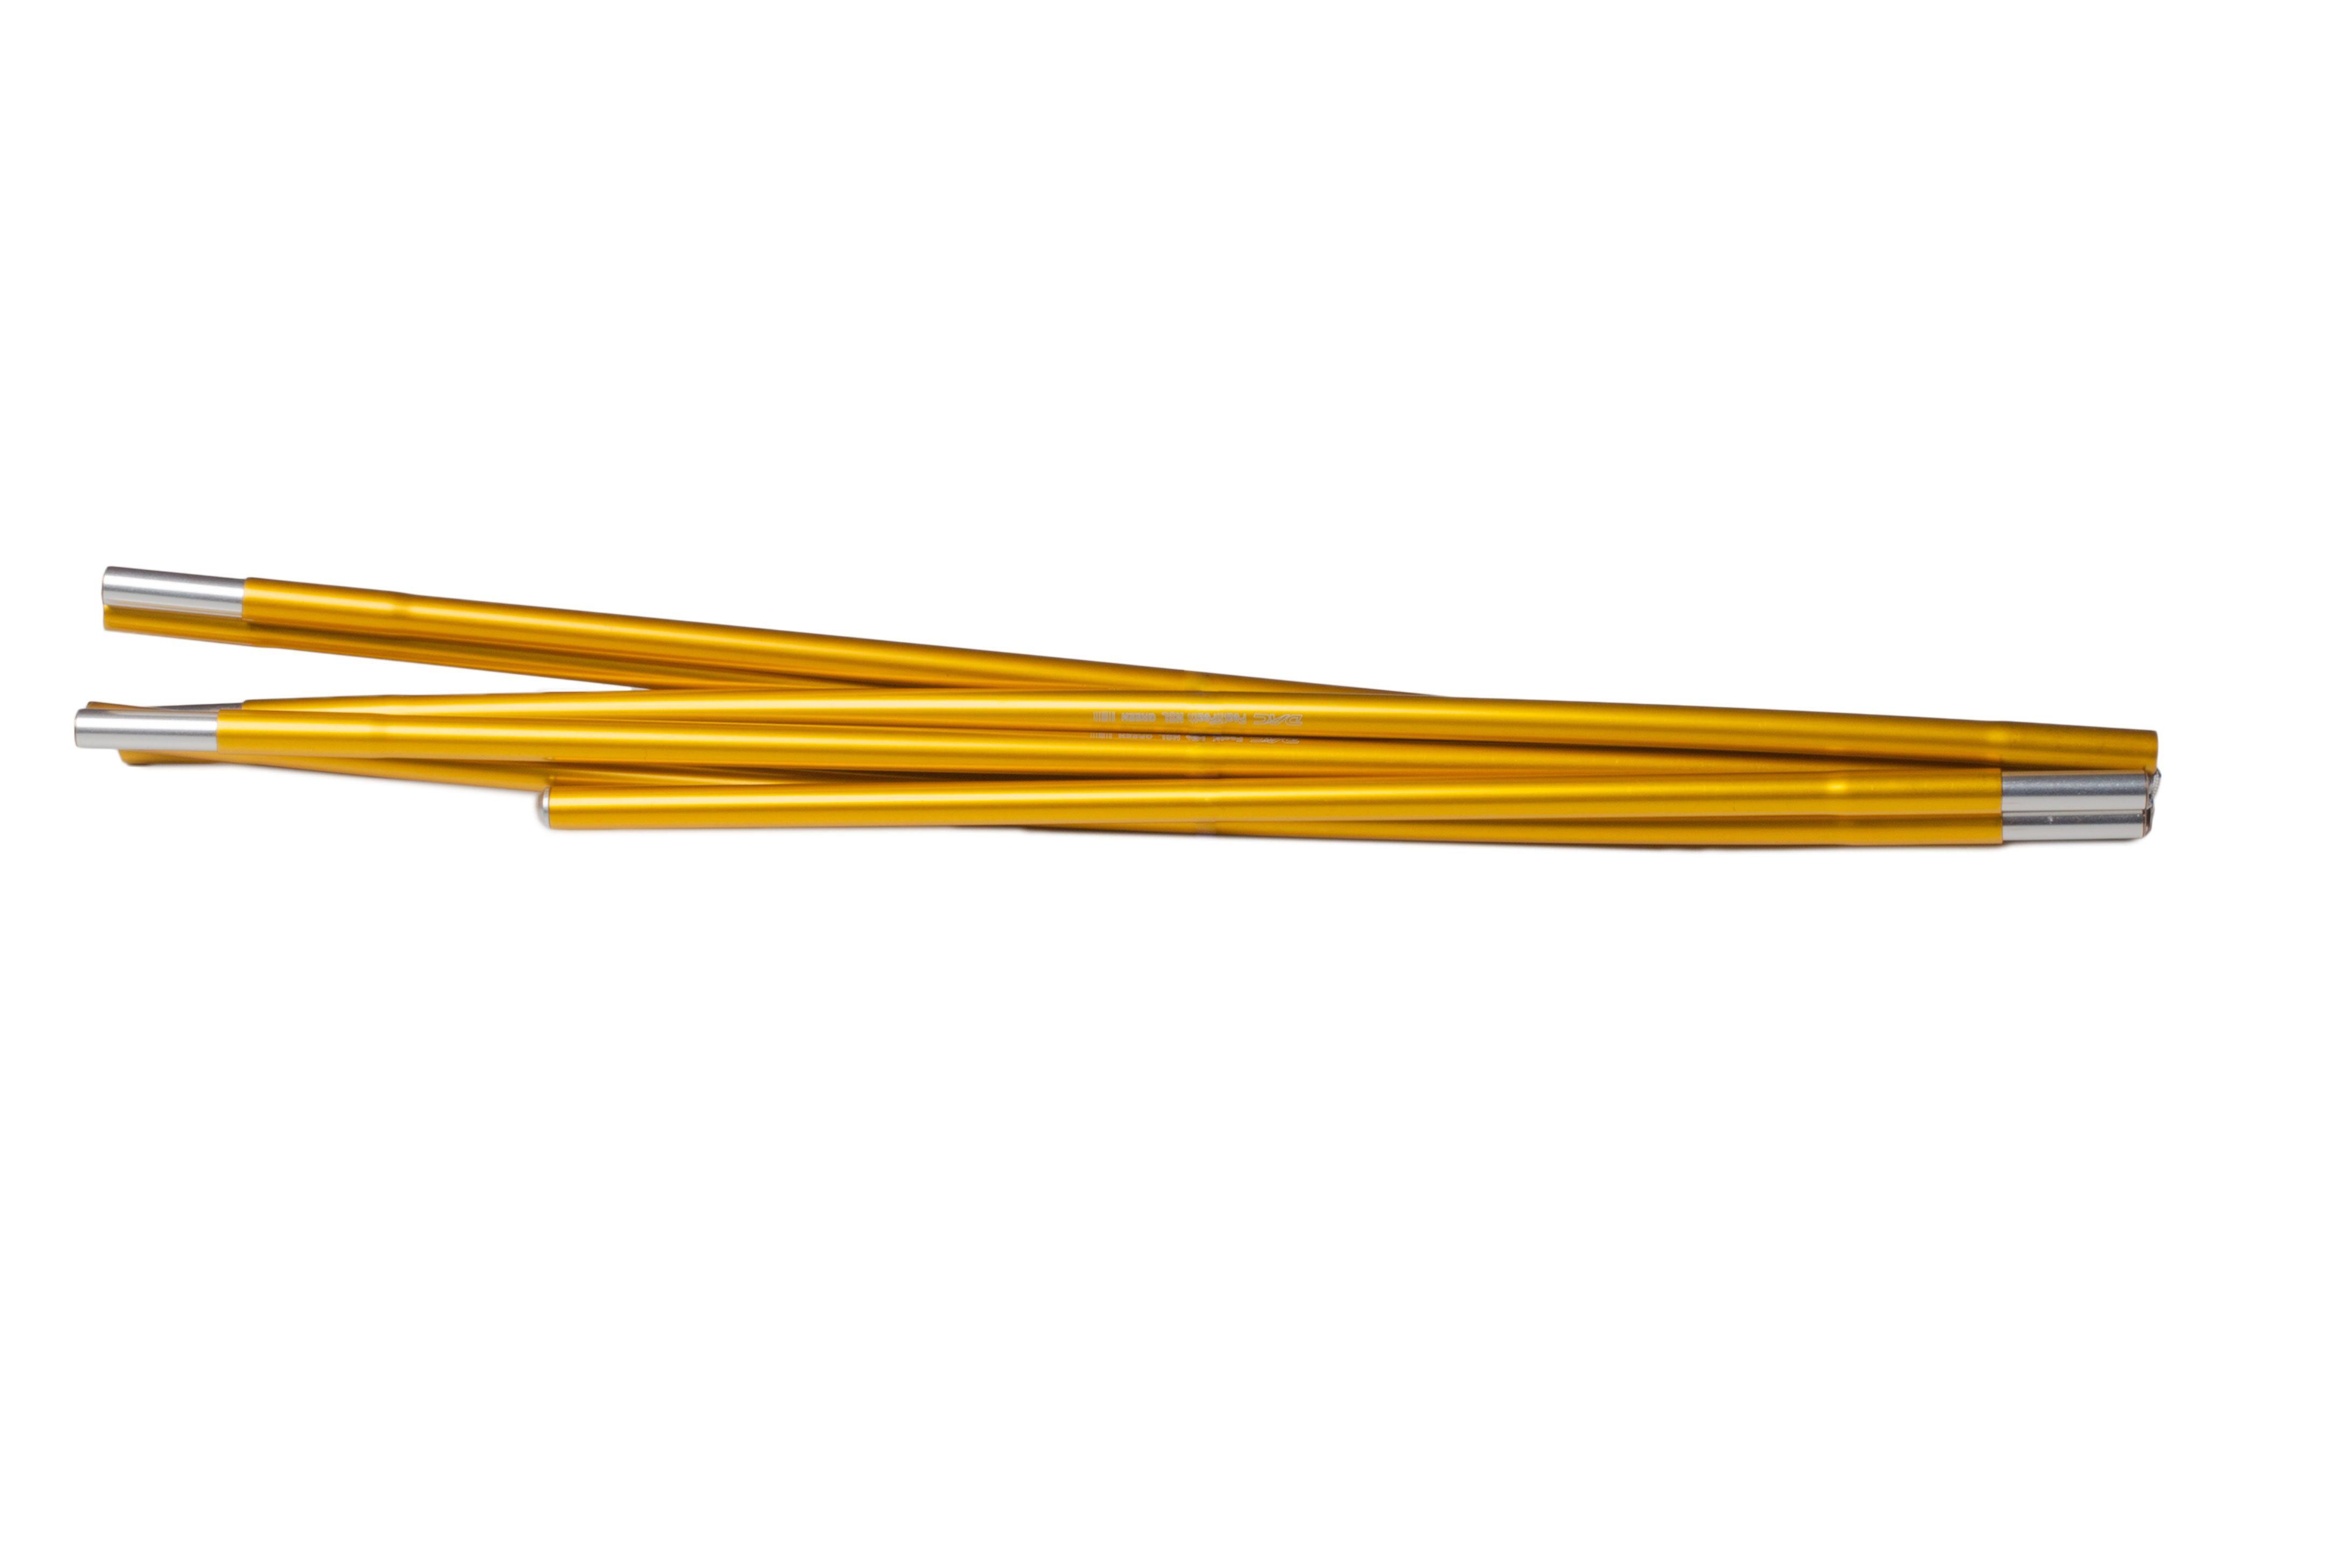 Arceau Pole 285cm x 9 mm Hilleberg Anjan 3, Anjan 3 GT, Nallo 3, Nallo 3 GT, Kaitum 3, Kaitum 3 GT, Soulo